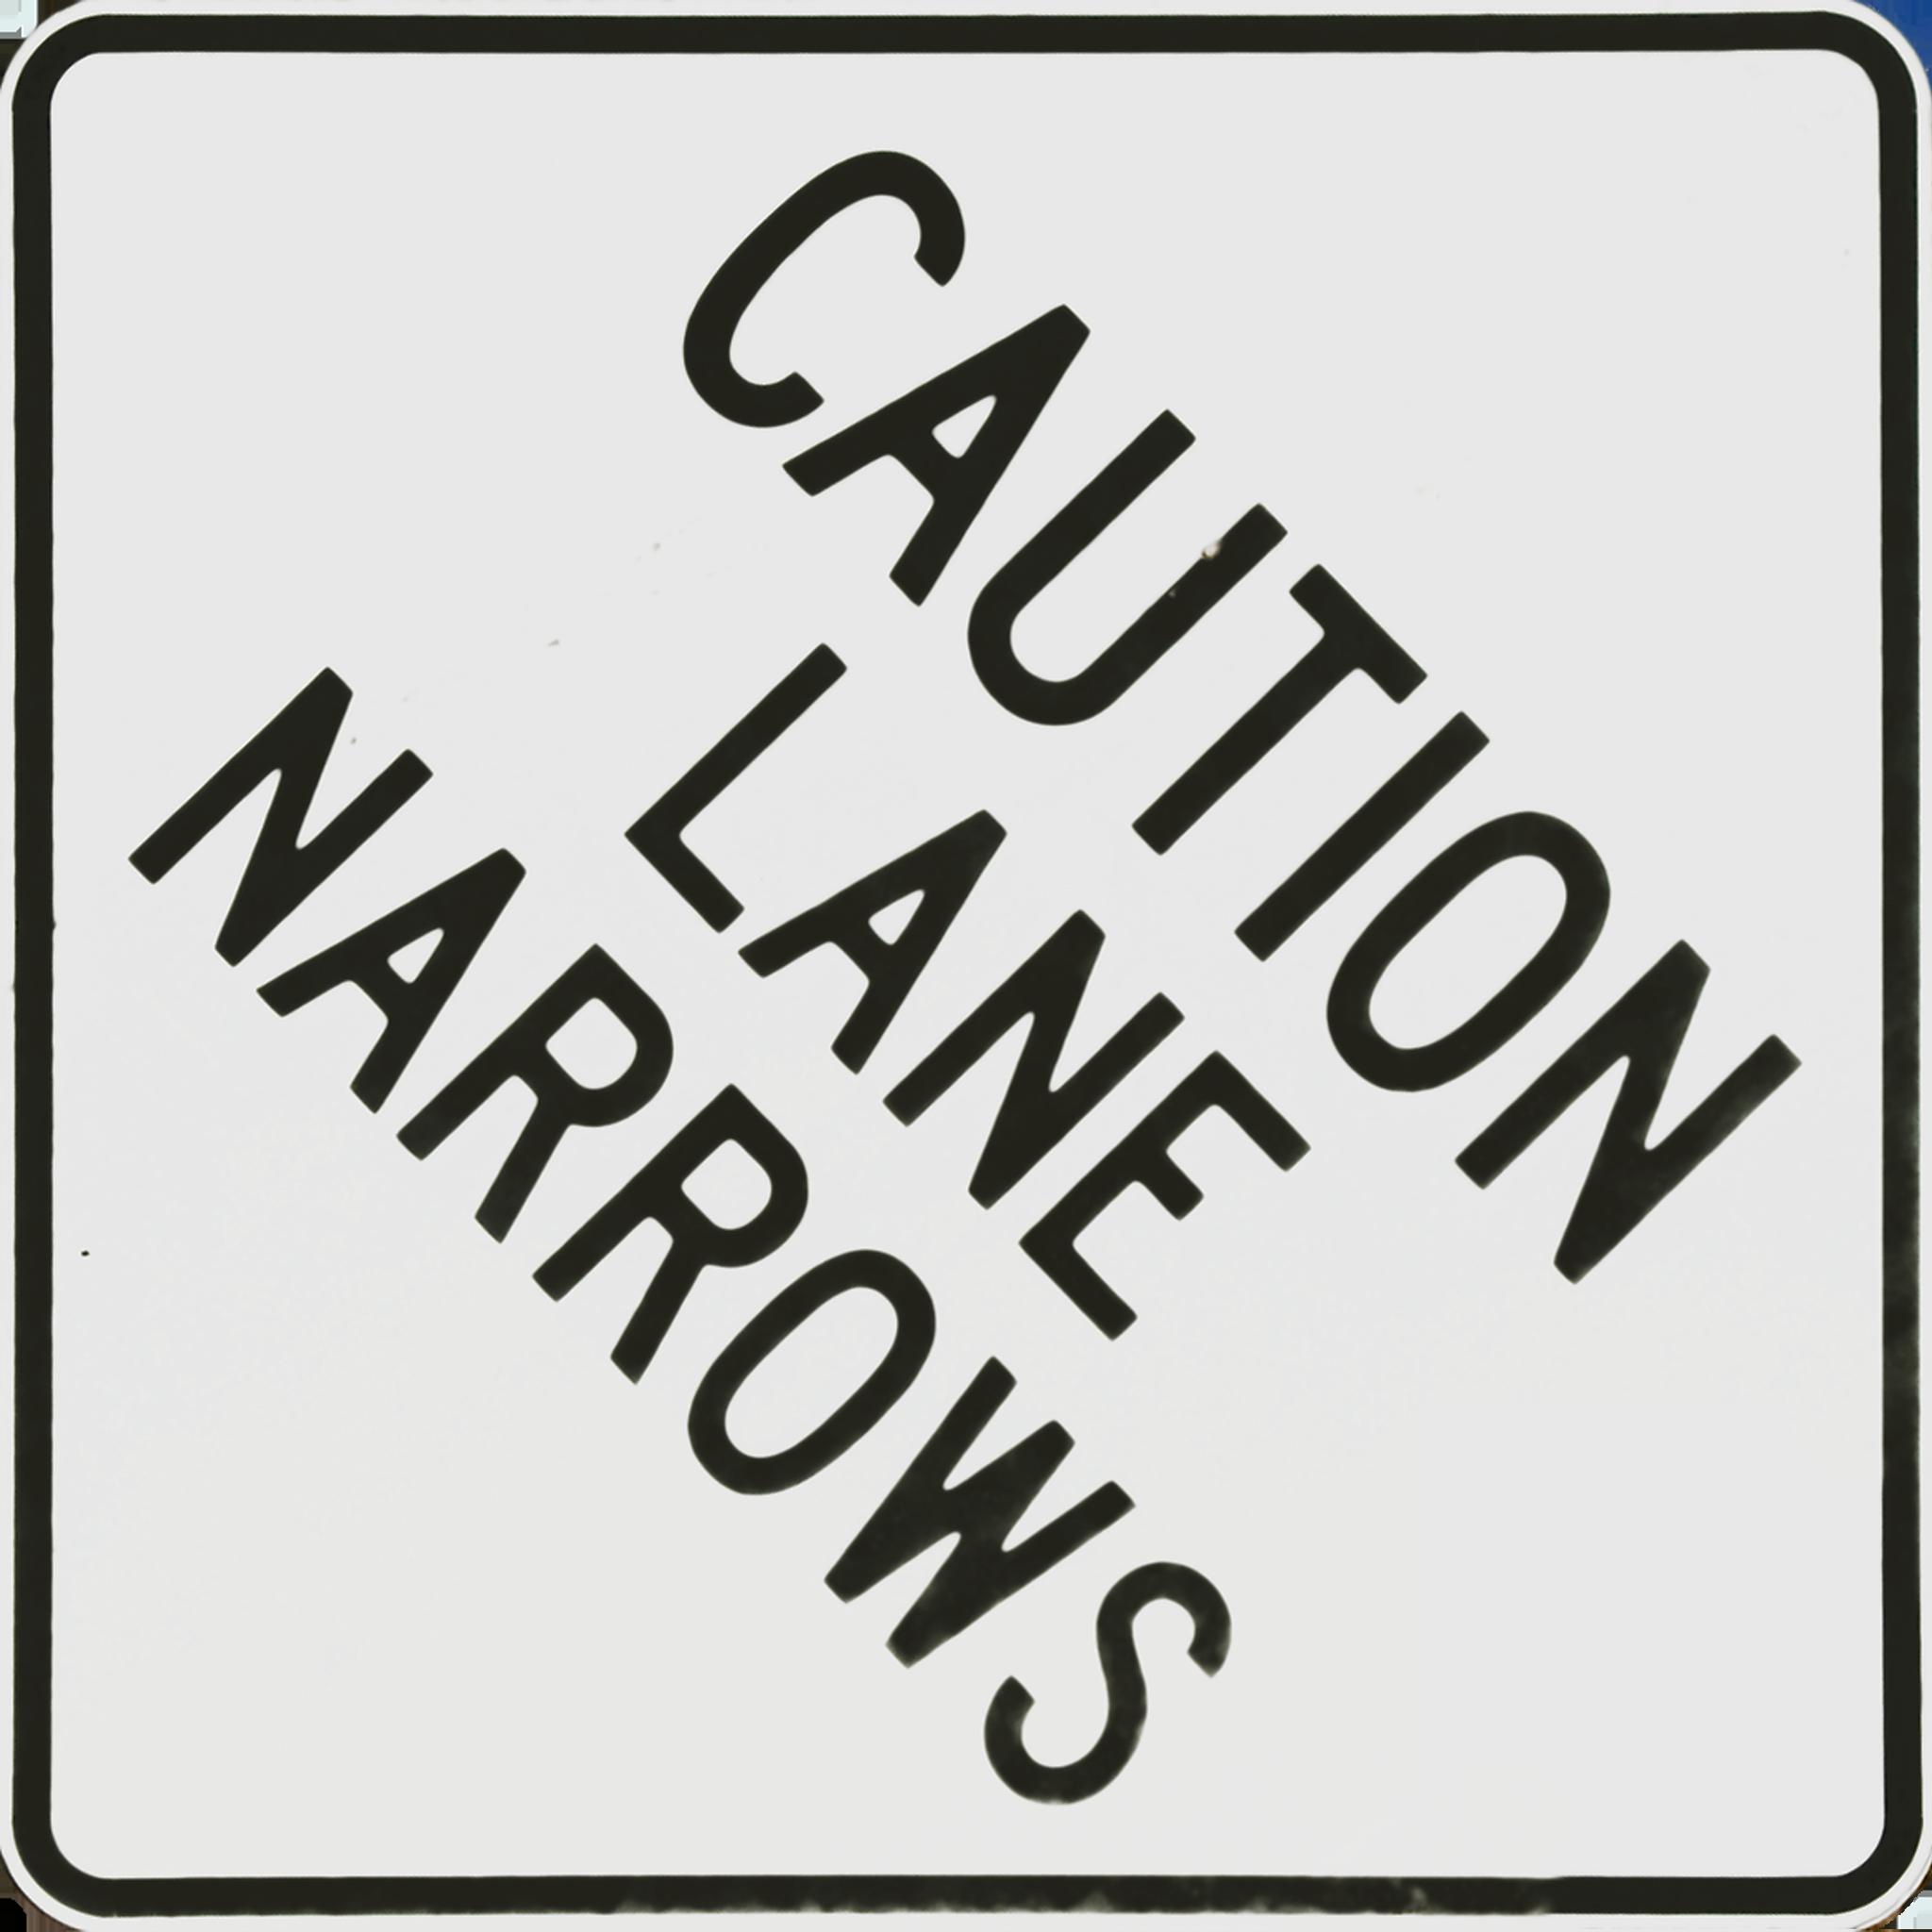 Caution Lane Narrows.png